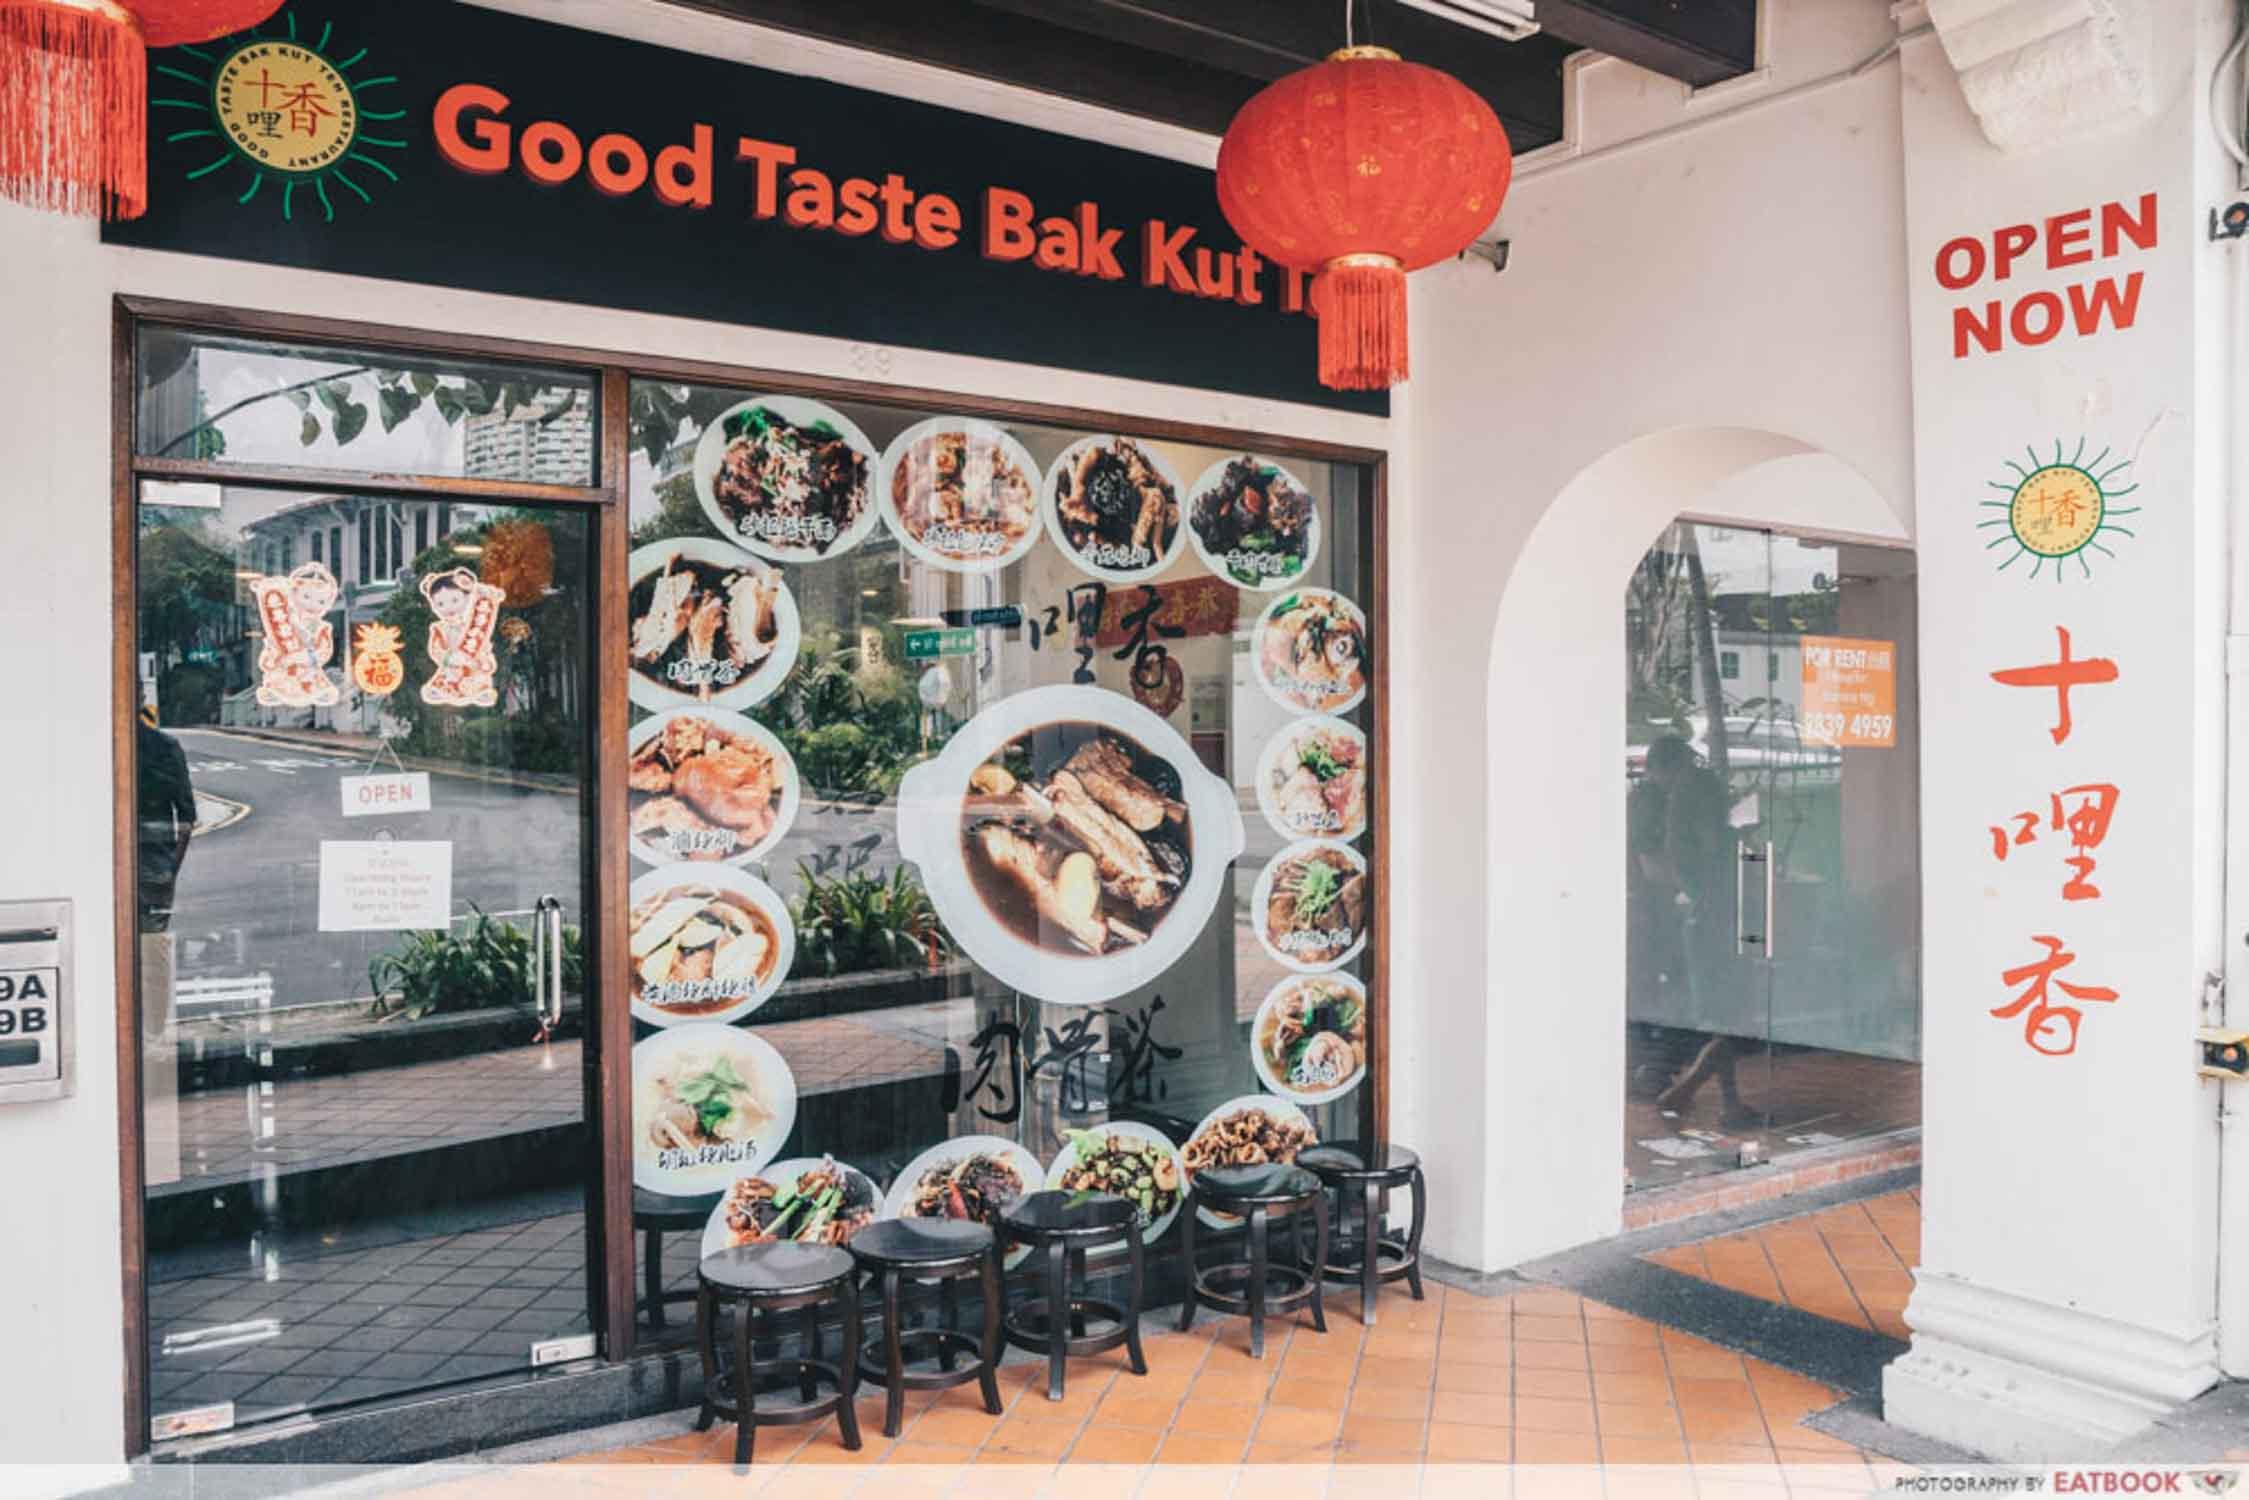 Good Taste Bak Kut Teh - Ambience